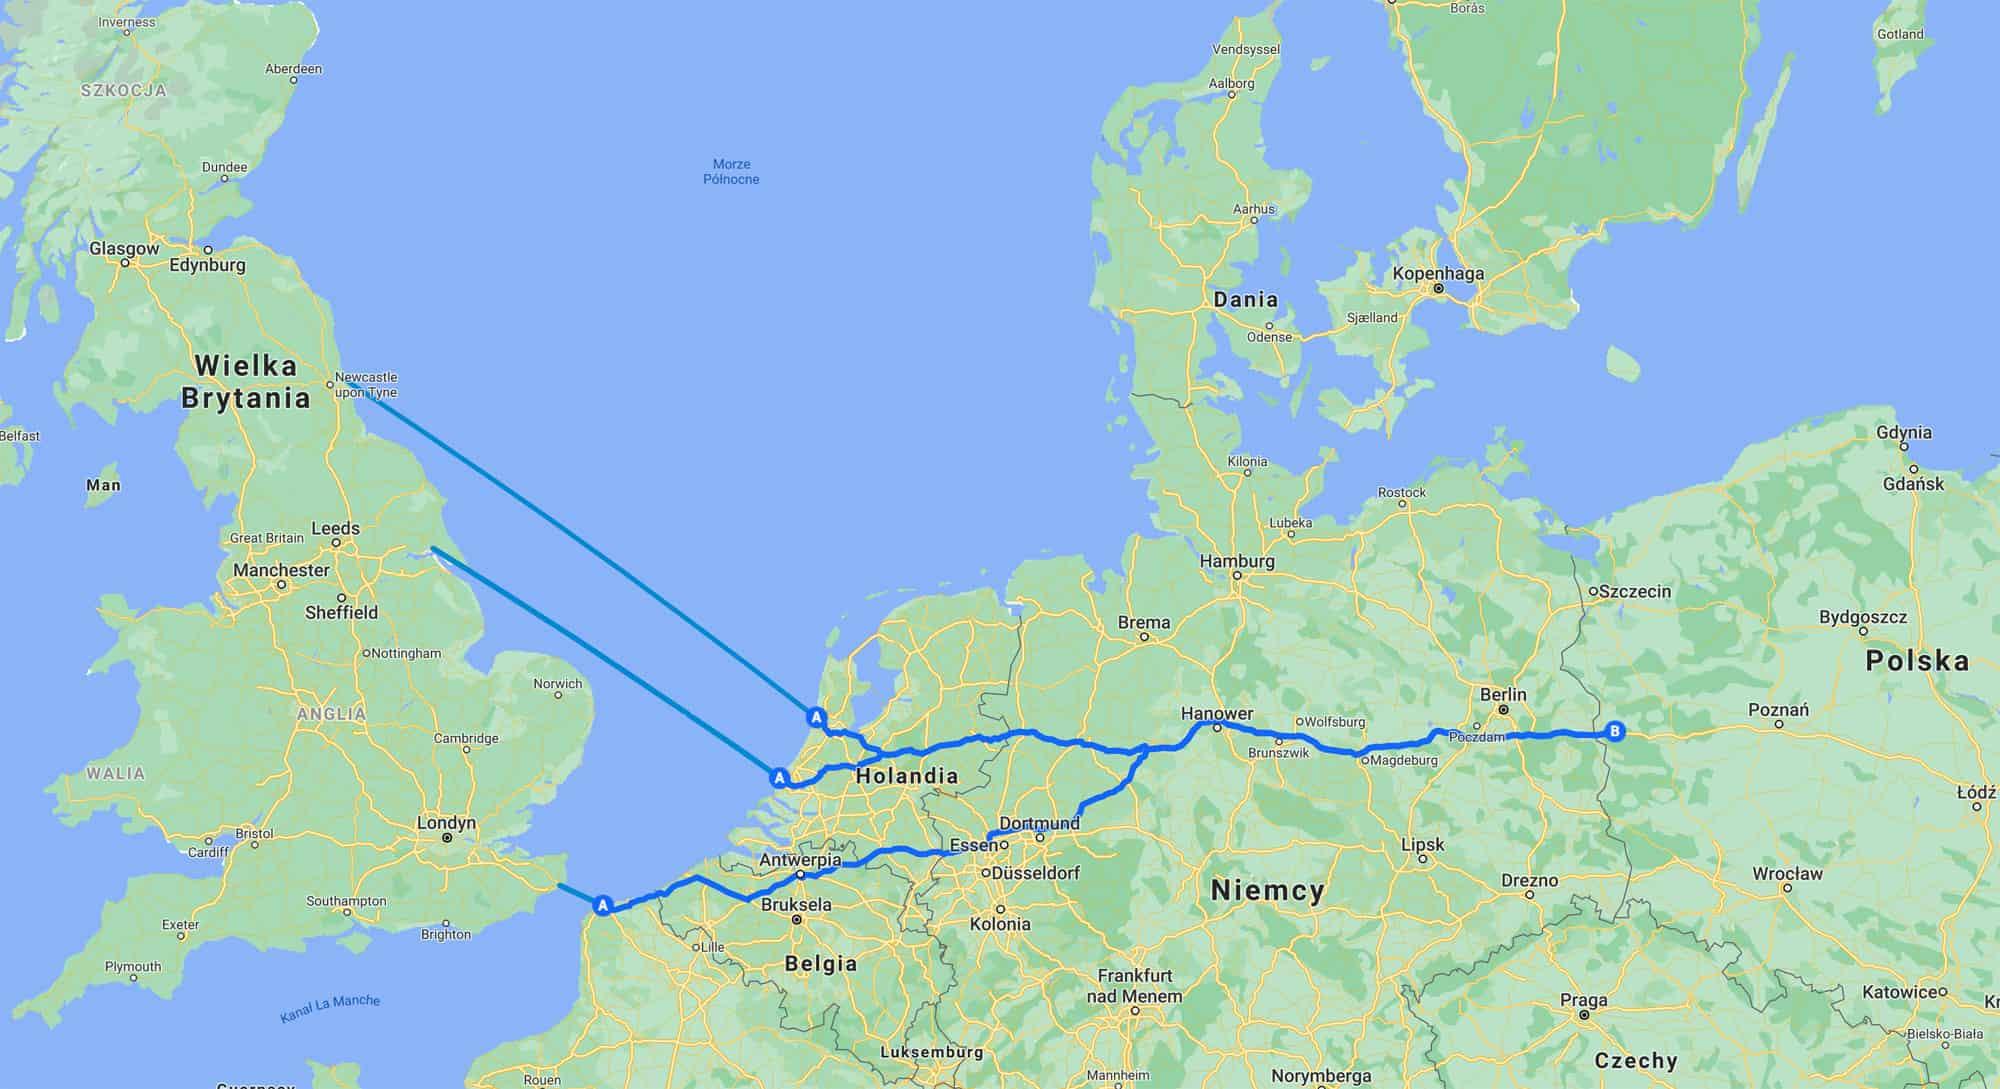 Mapa promy z Anglii do Holandii, Francji i Polski.